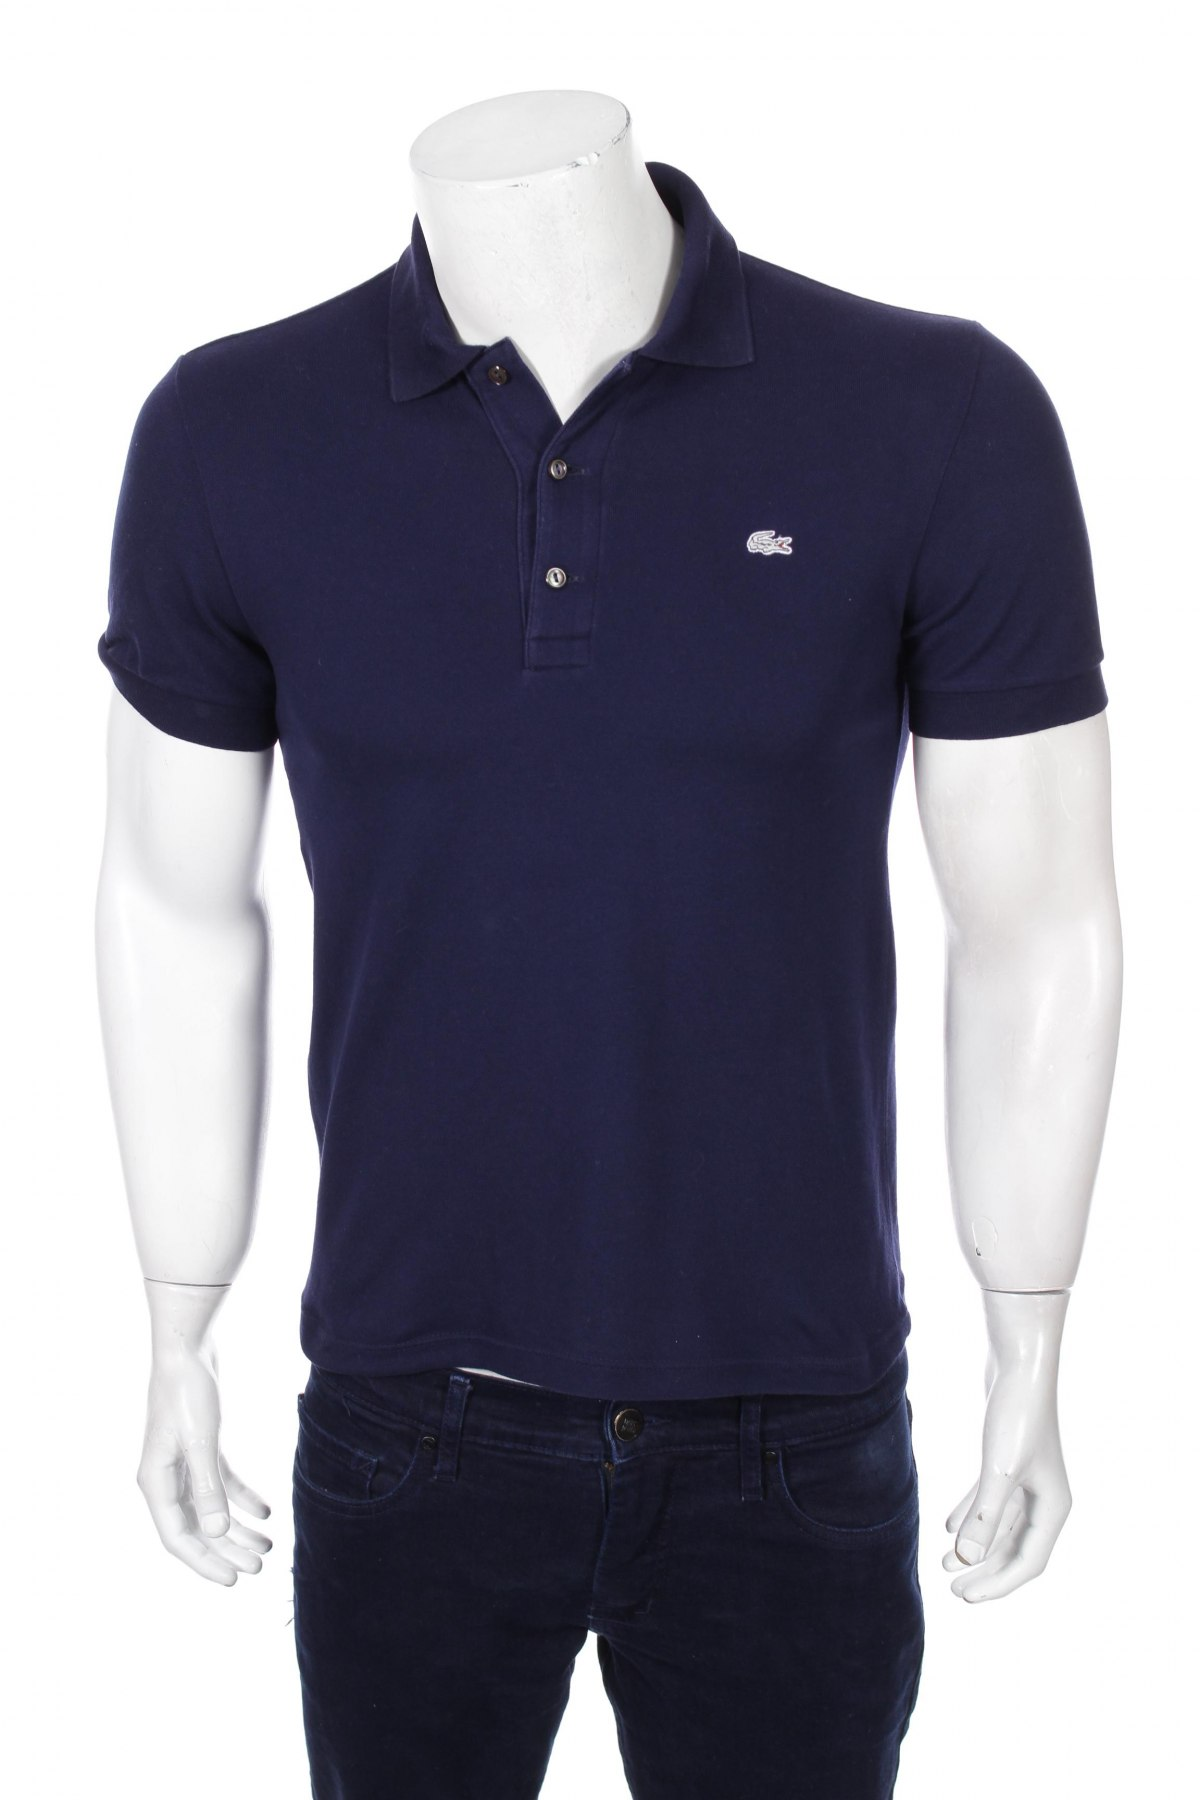 cheap for discount 031eb 6ddd7 Herren T-Shirt Lacoste